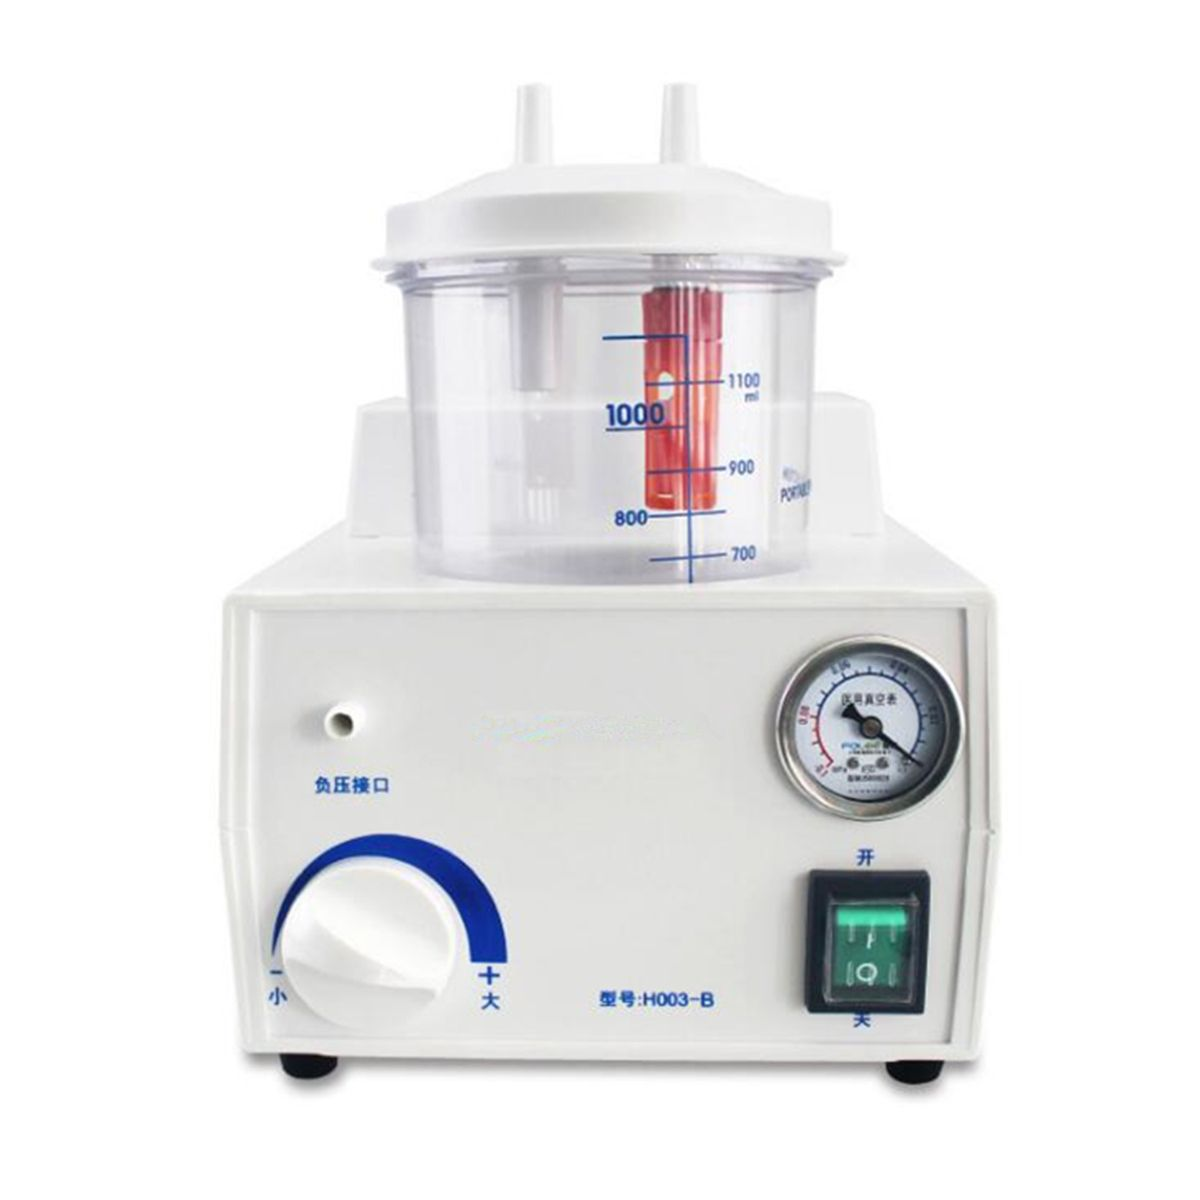 Portable Dental Vacuum Phlegm Suction Unit Piston Pump Electric Medical Emergency Sputum Aspirator Machine Equipment 1000mL